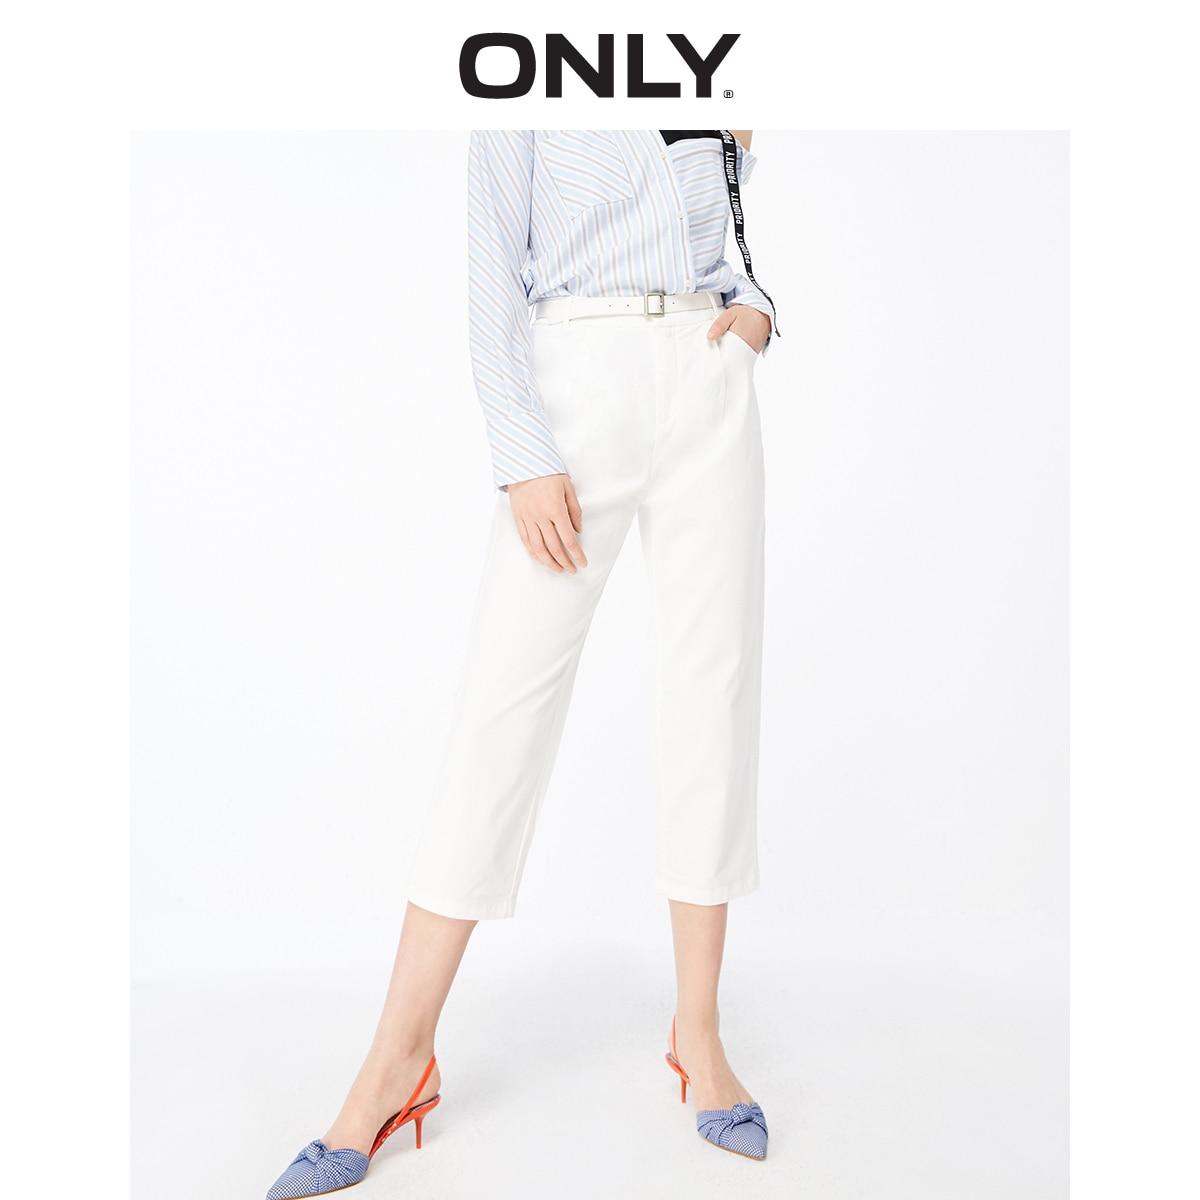 ONLY Women's Loose Fit Capri Pants | 11916J527